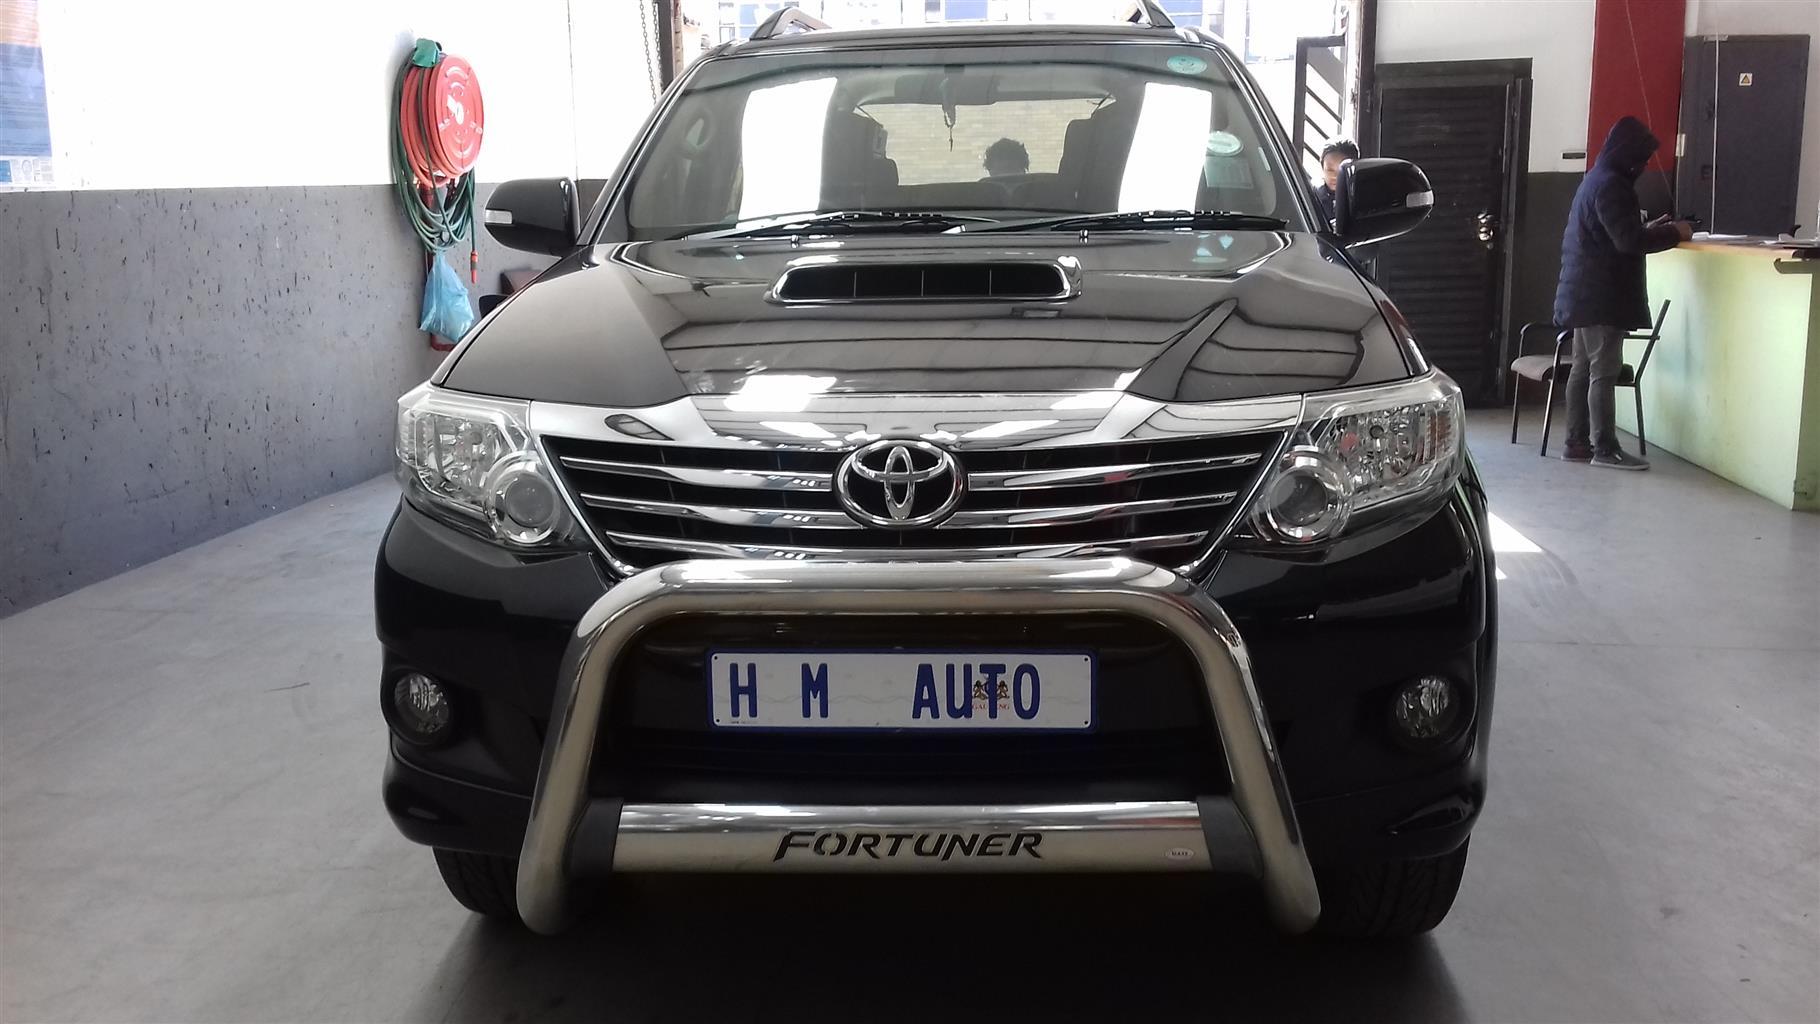 2013 Toyota Fortuner 3.0D 4D auto